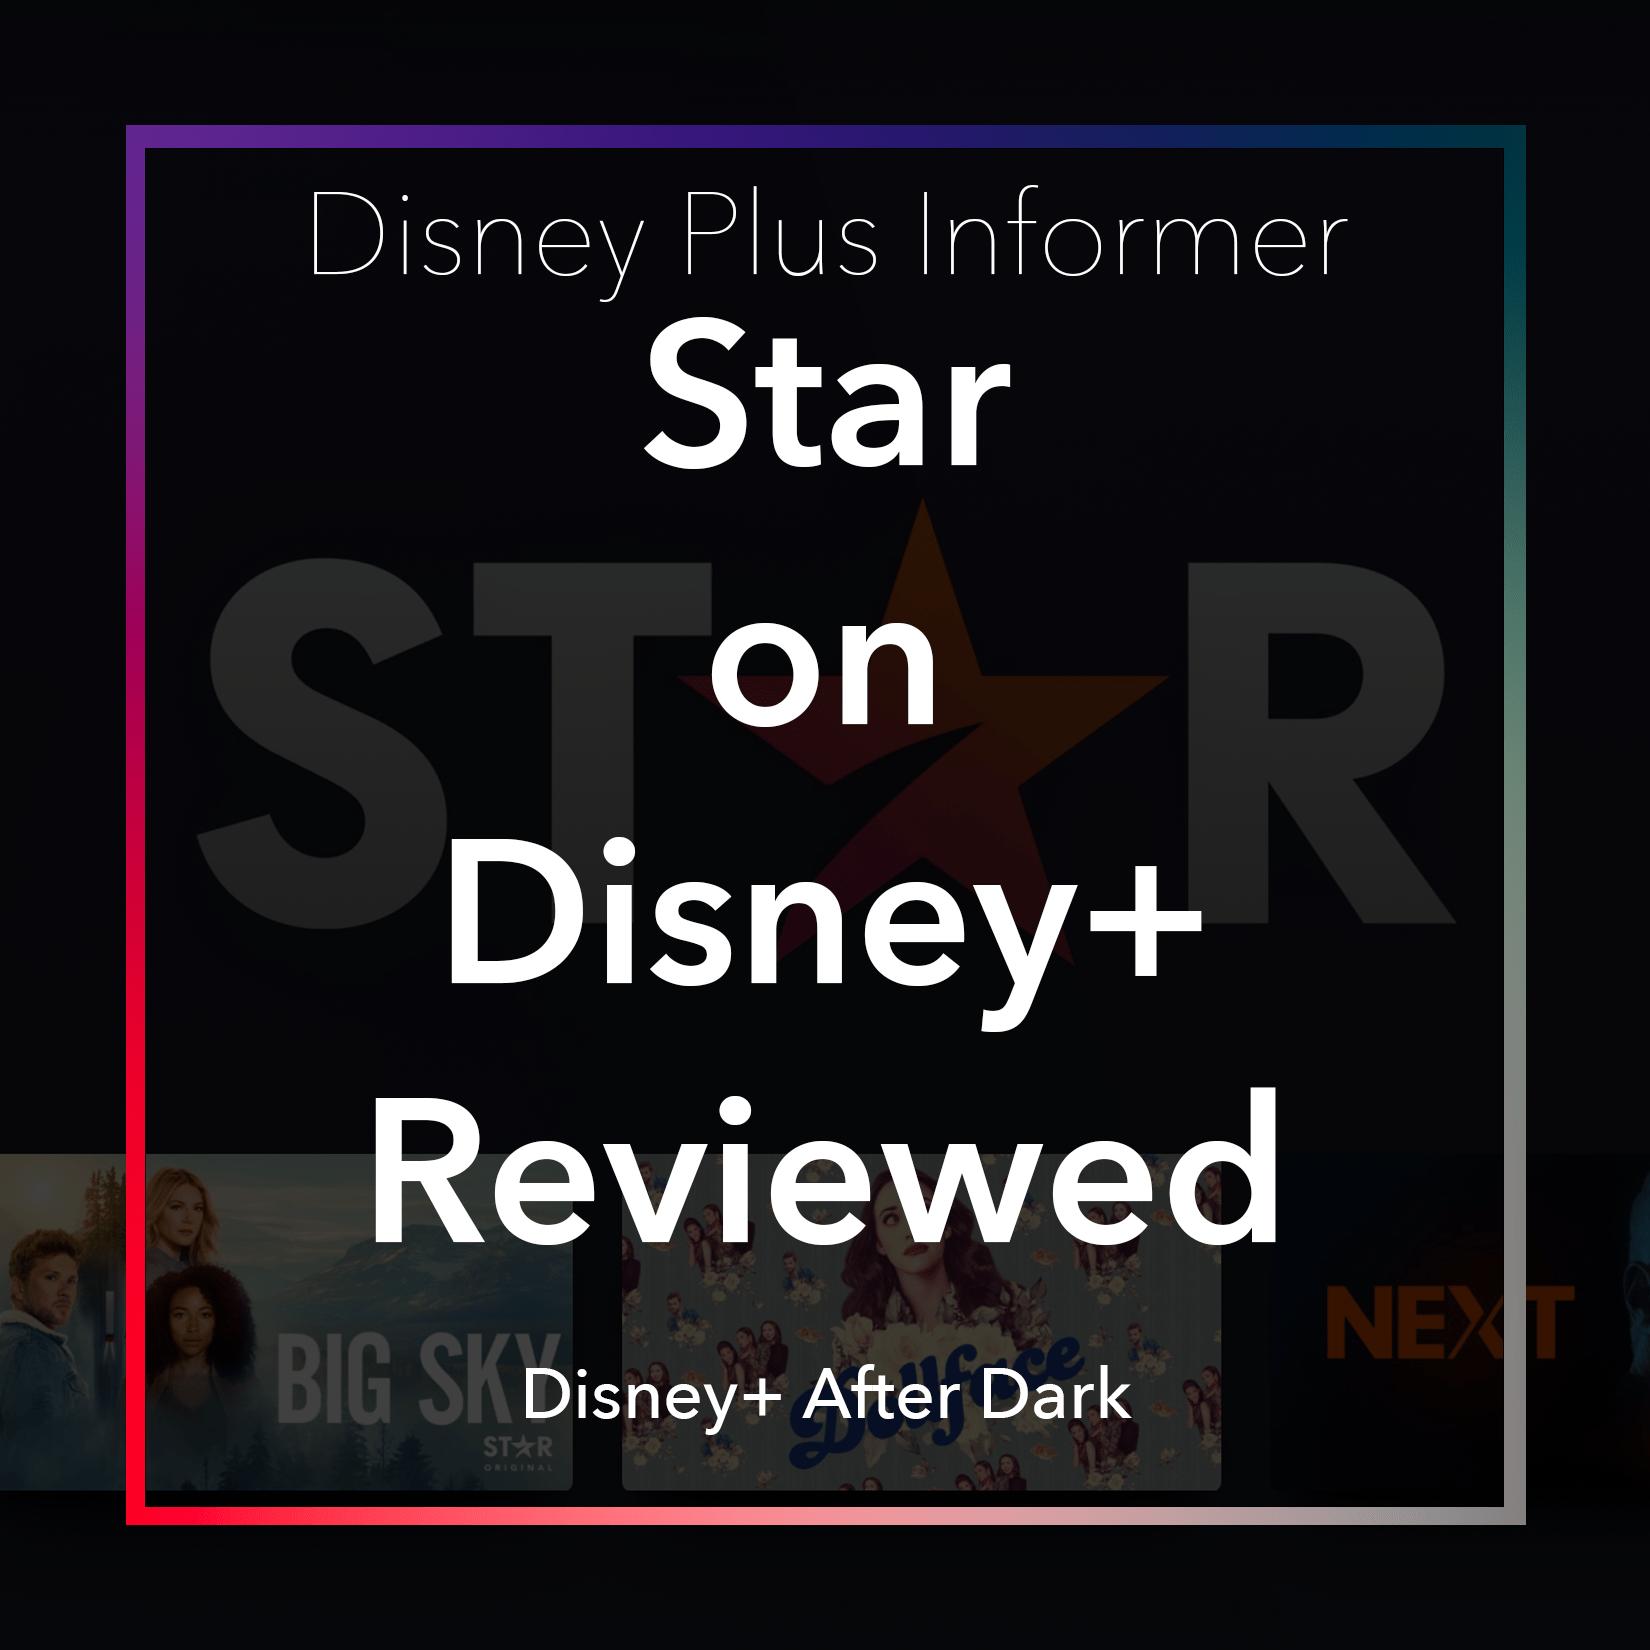 Disney Plus Star review